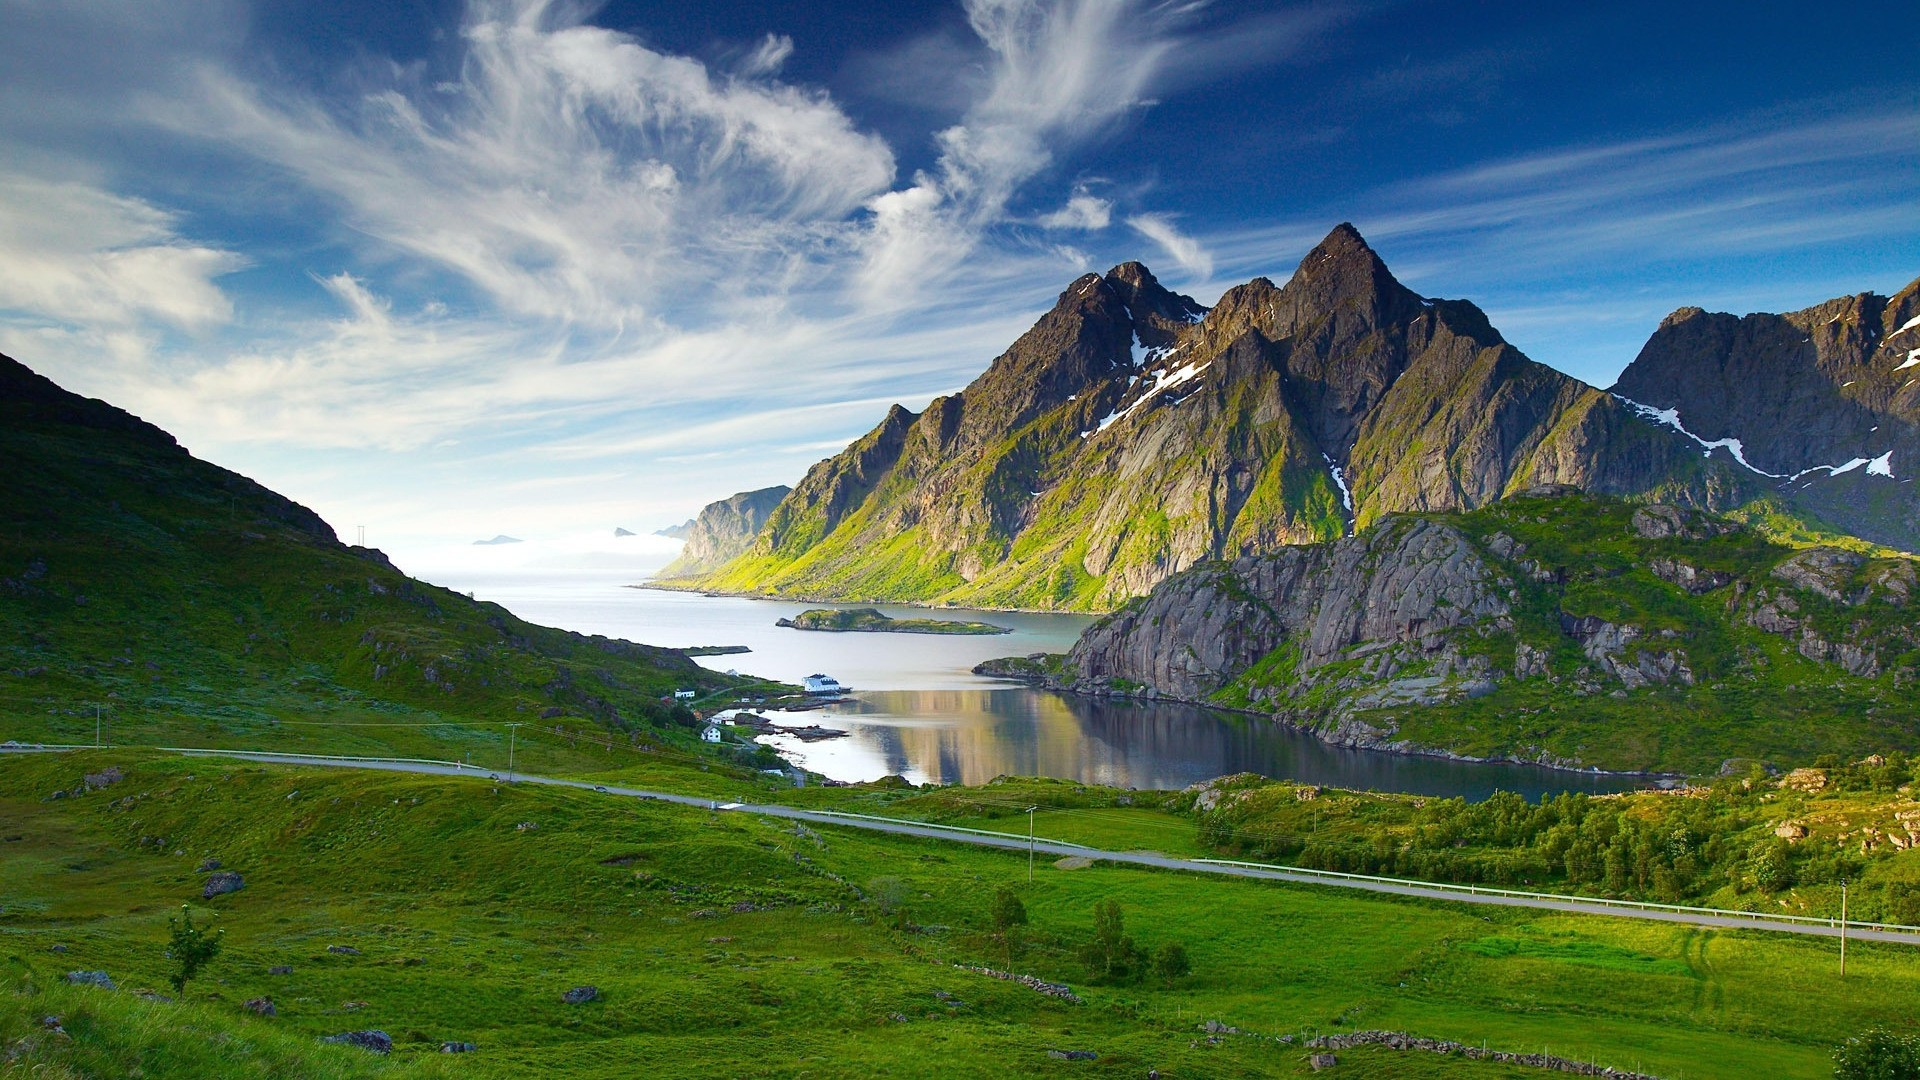 Green Mountains And Lake In Norway Widescreen High Resolution Wallpaper Download Free Adipta Martulandi